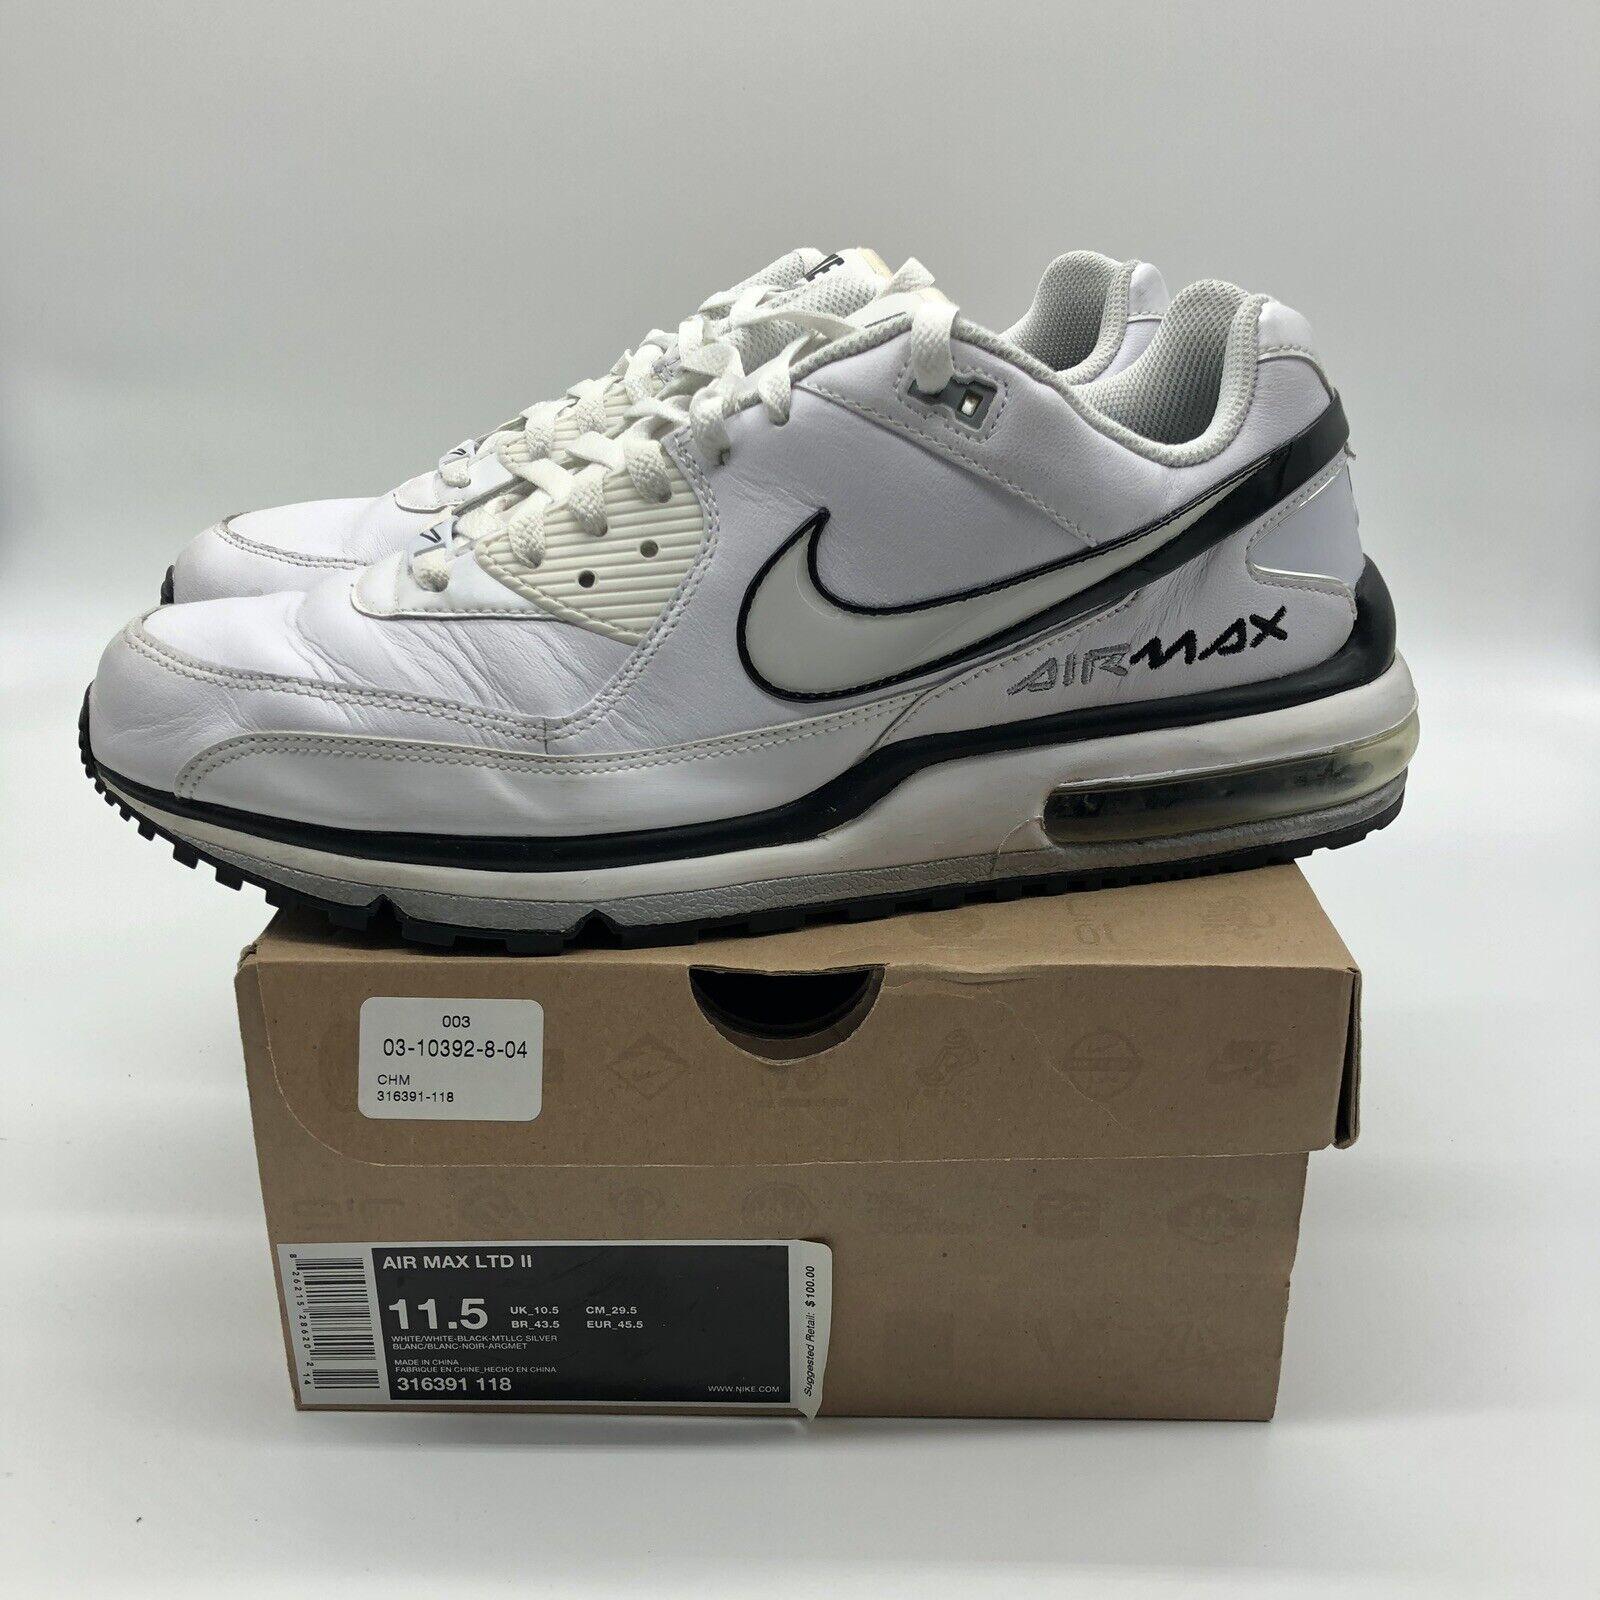 Nike Air Max Ltd li Talia White Black Silver Size 11.5 316391-118